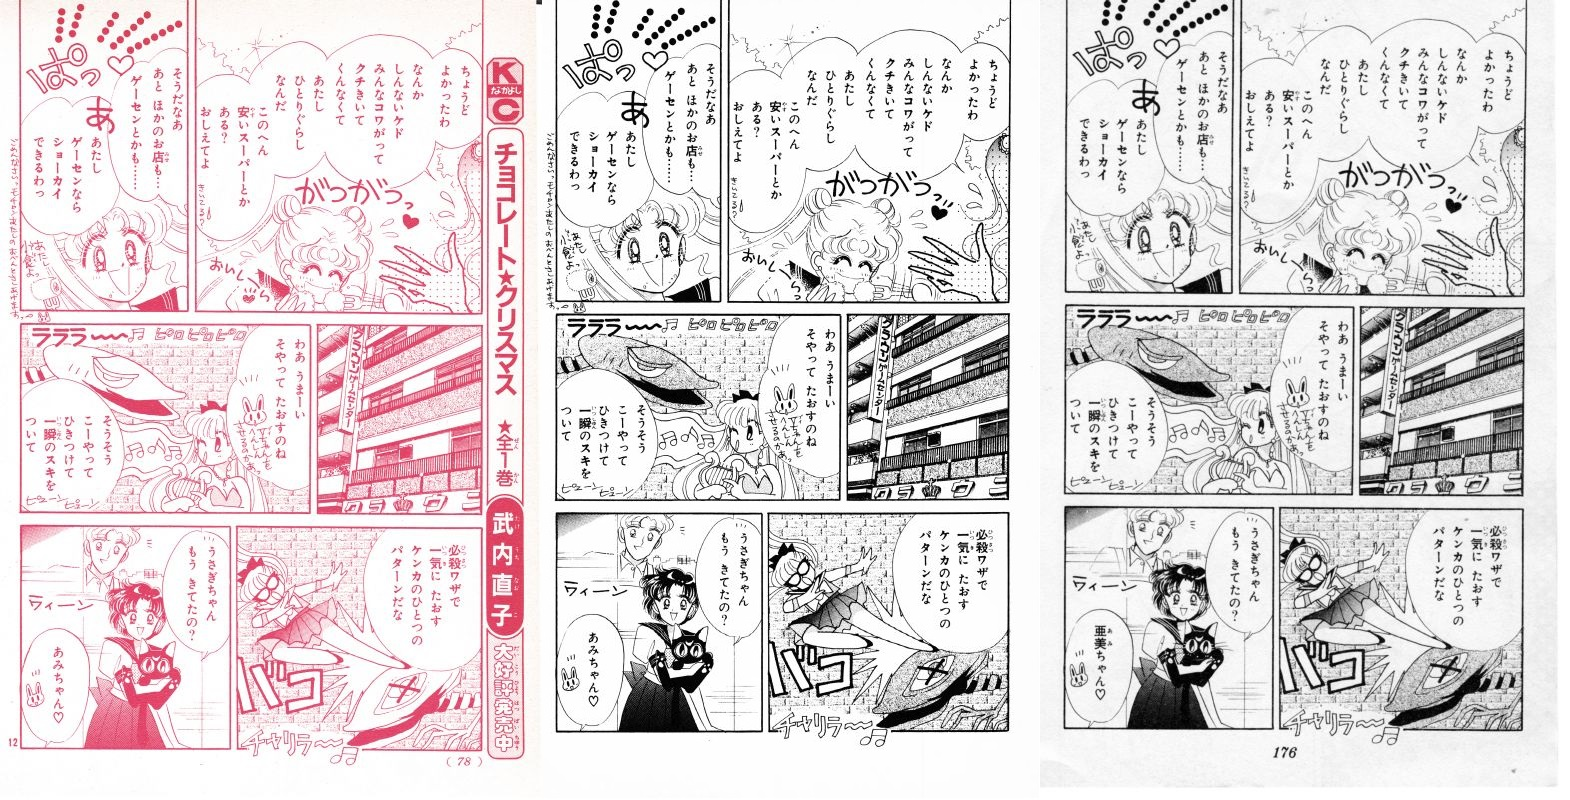 Act 5, Page 10 – Nakayoshi, Original, Remaster